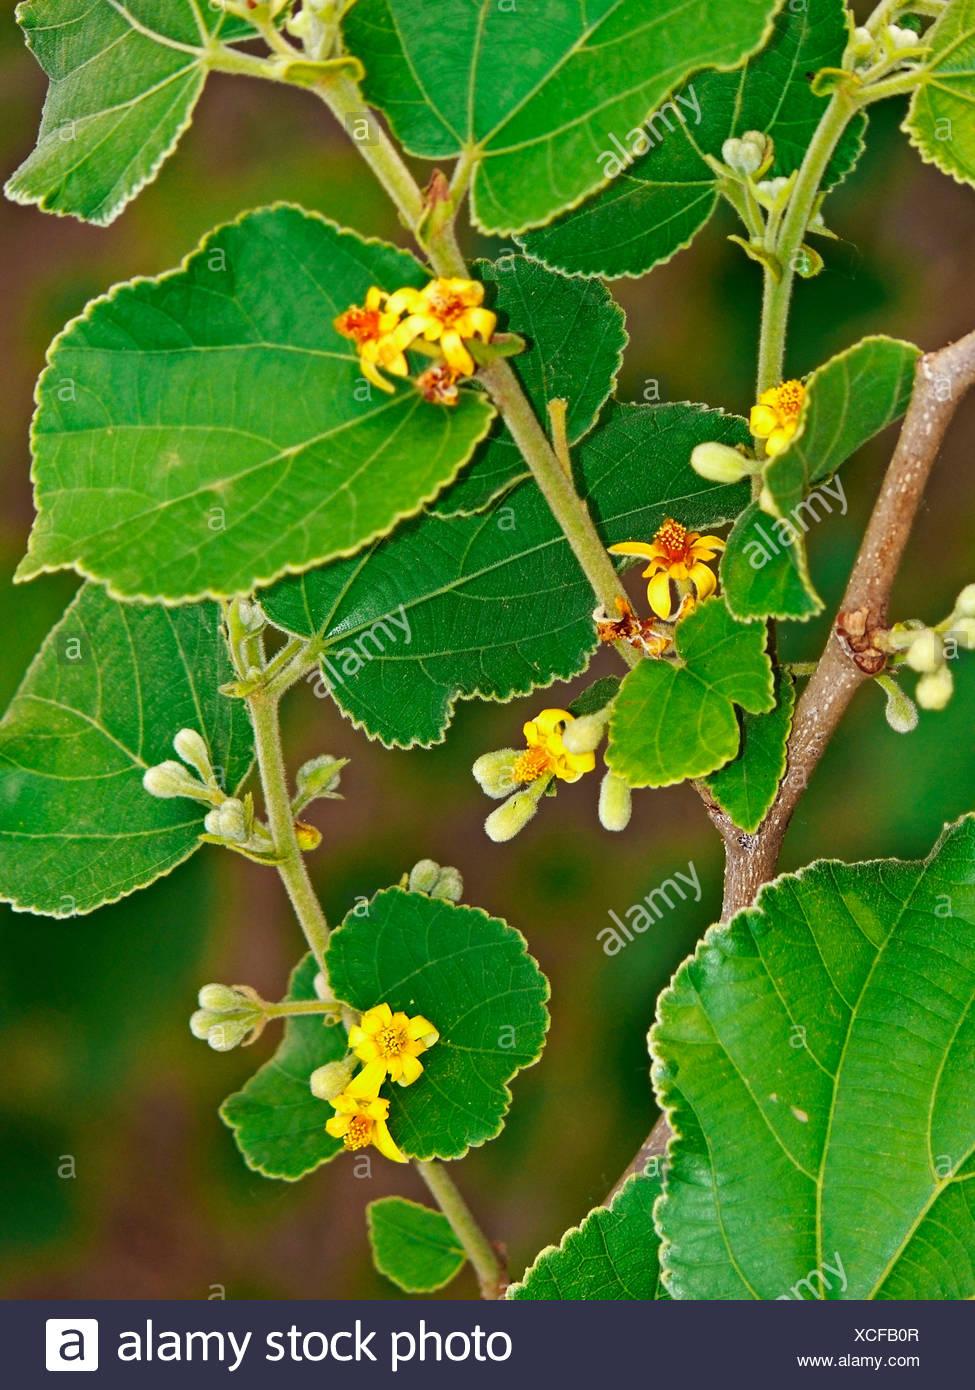 Grewia asiatica, Phalsa - Stock Image